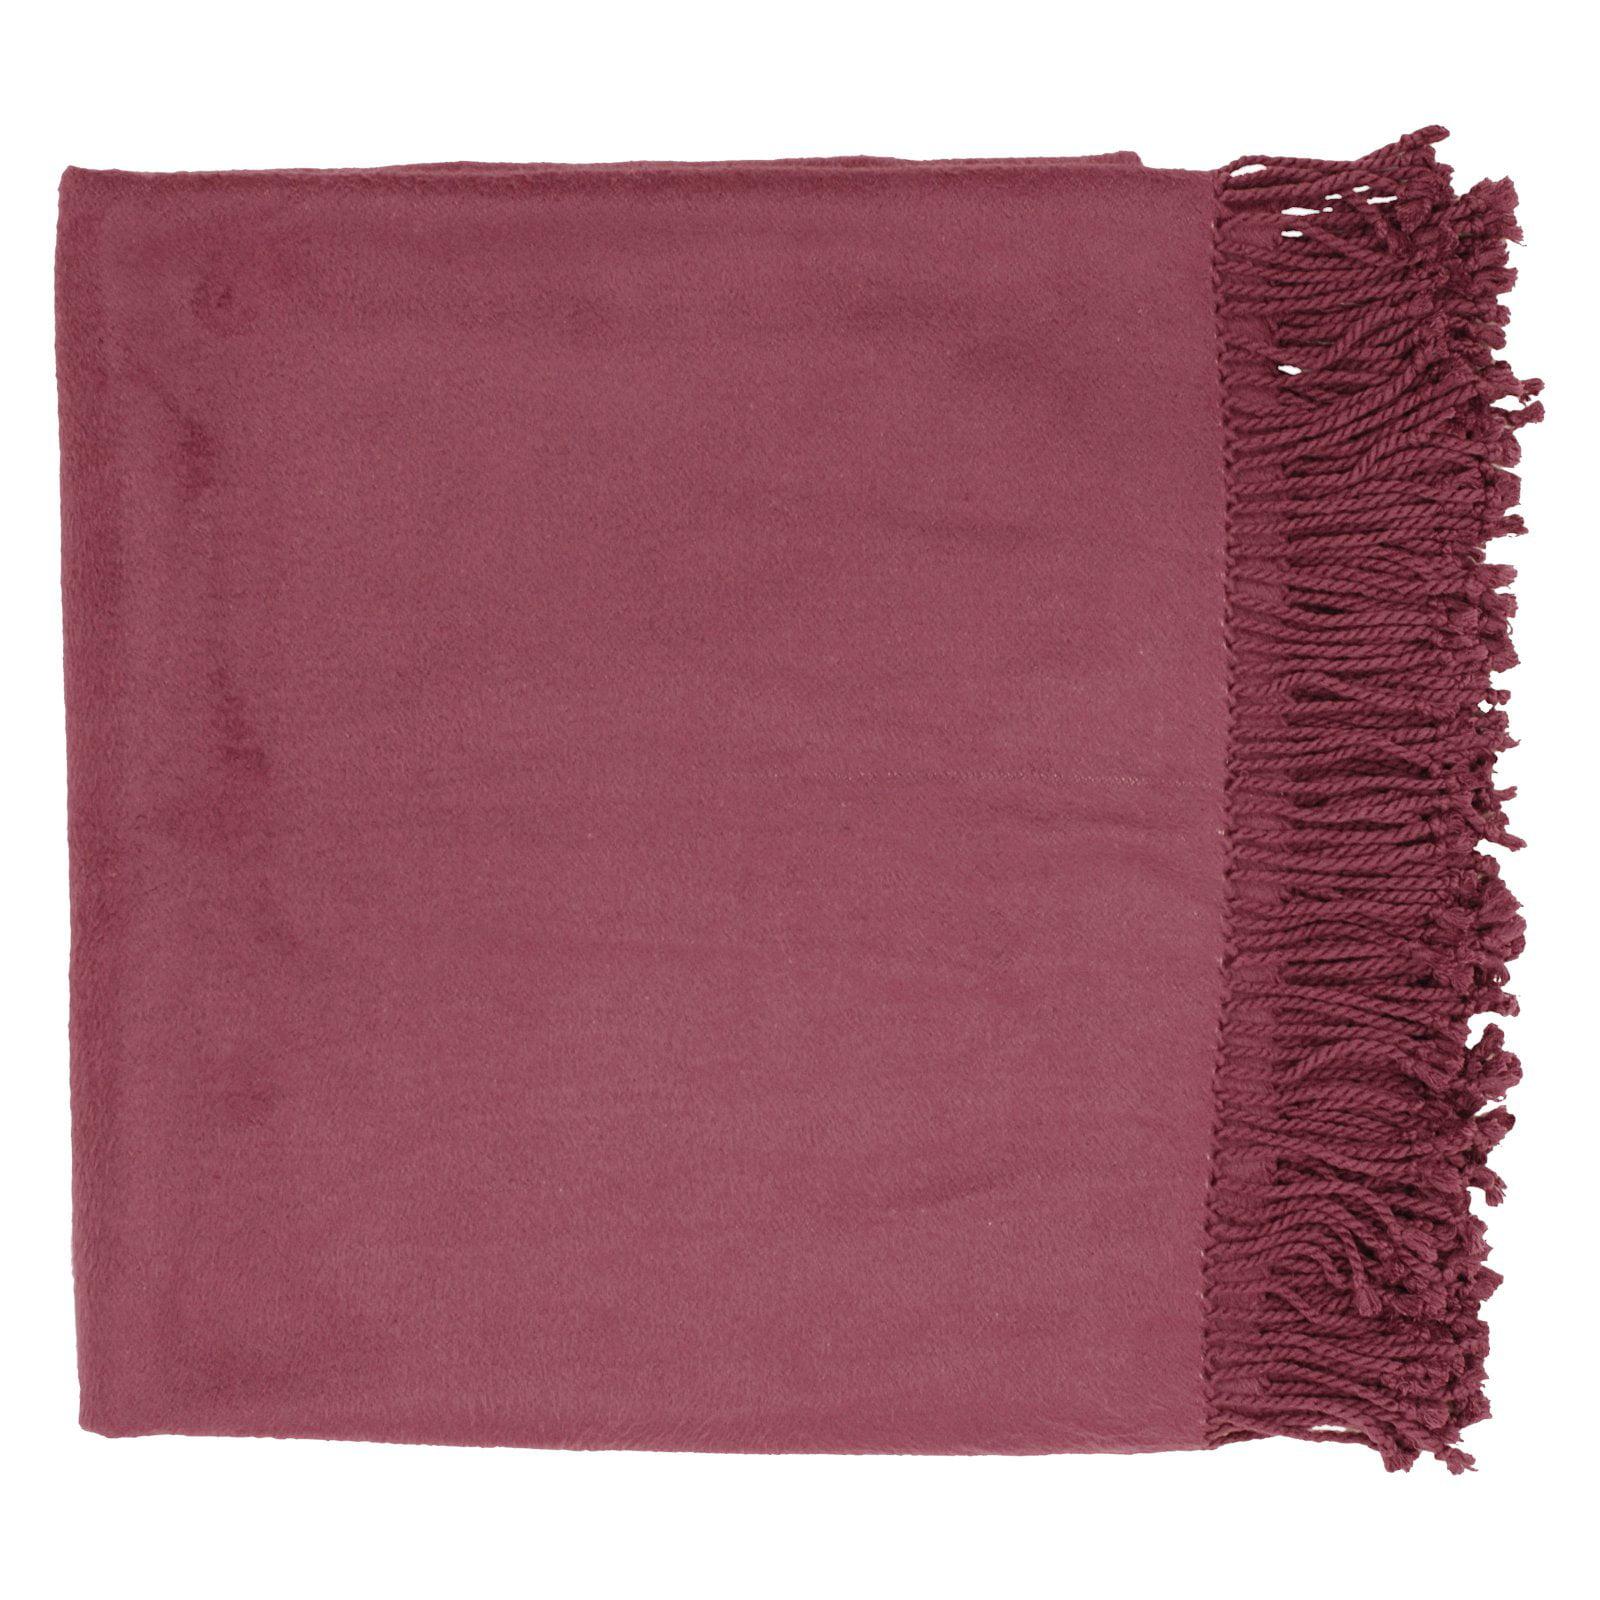 Surya Tian Tian Throw Blanket